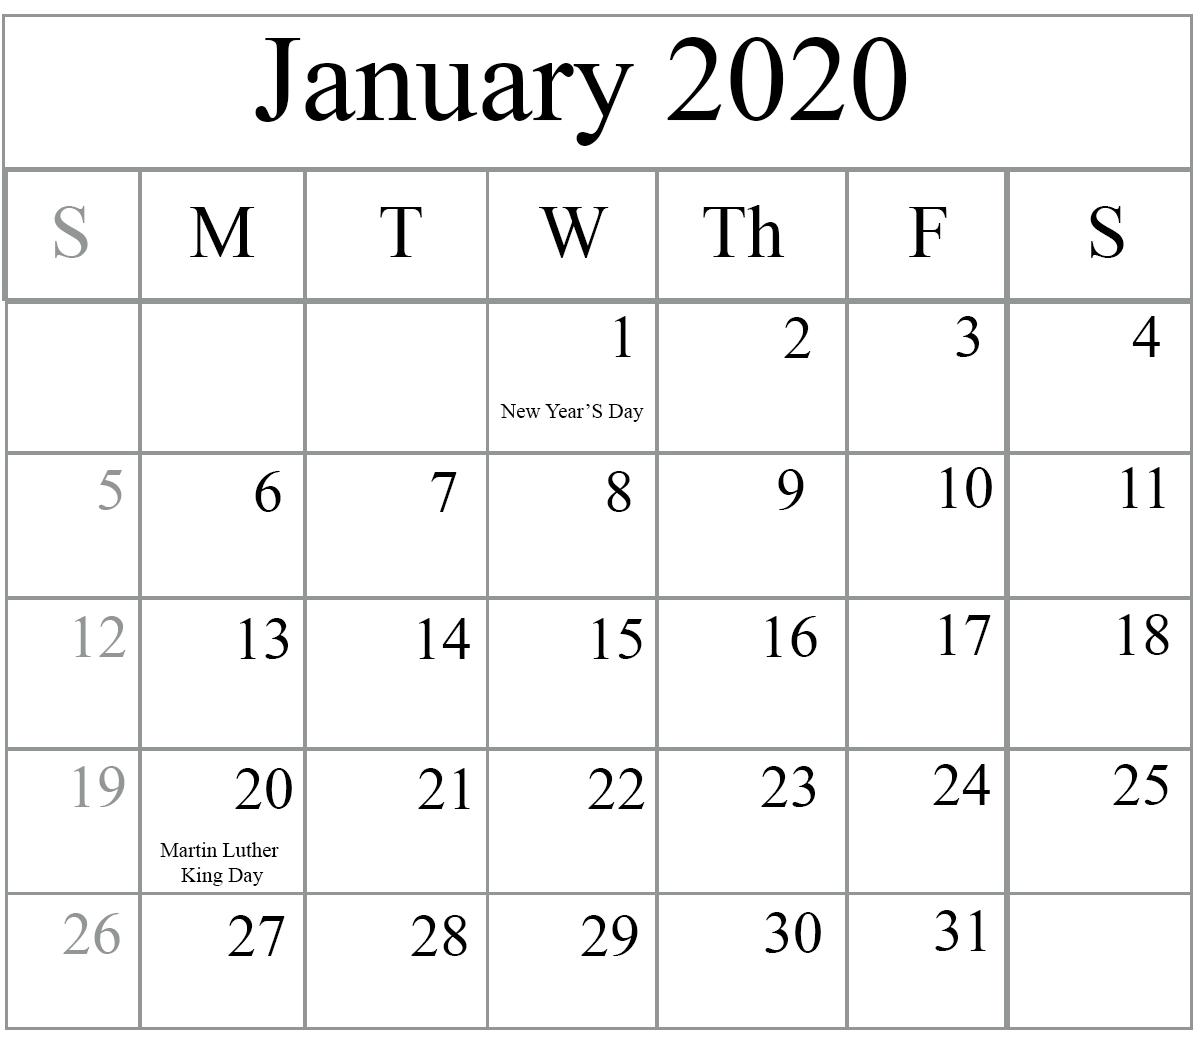 Blank January 2020 Calendar Printable In Pdf, Word, Excel-Printable January 2020 Calendar Word